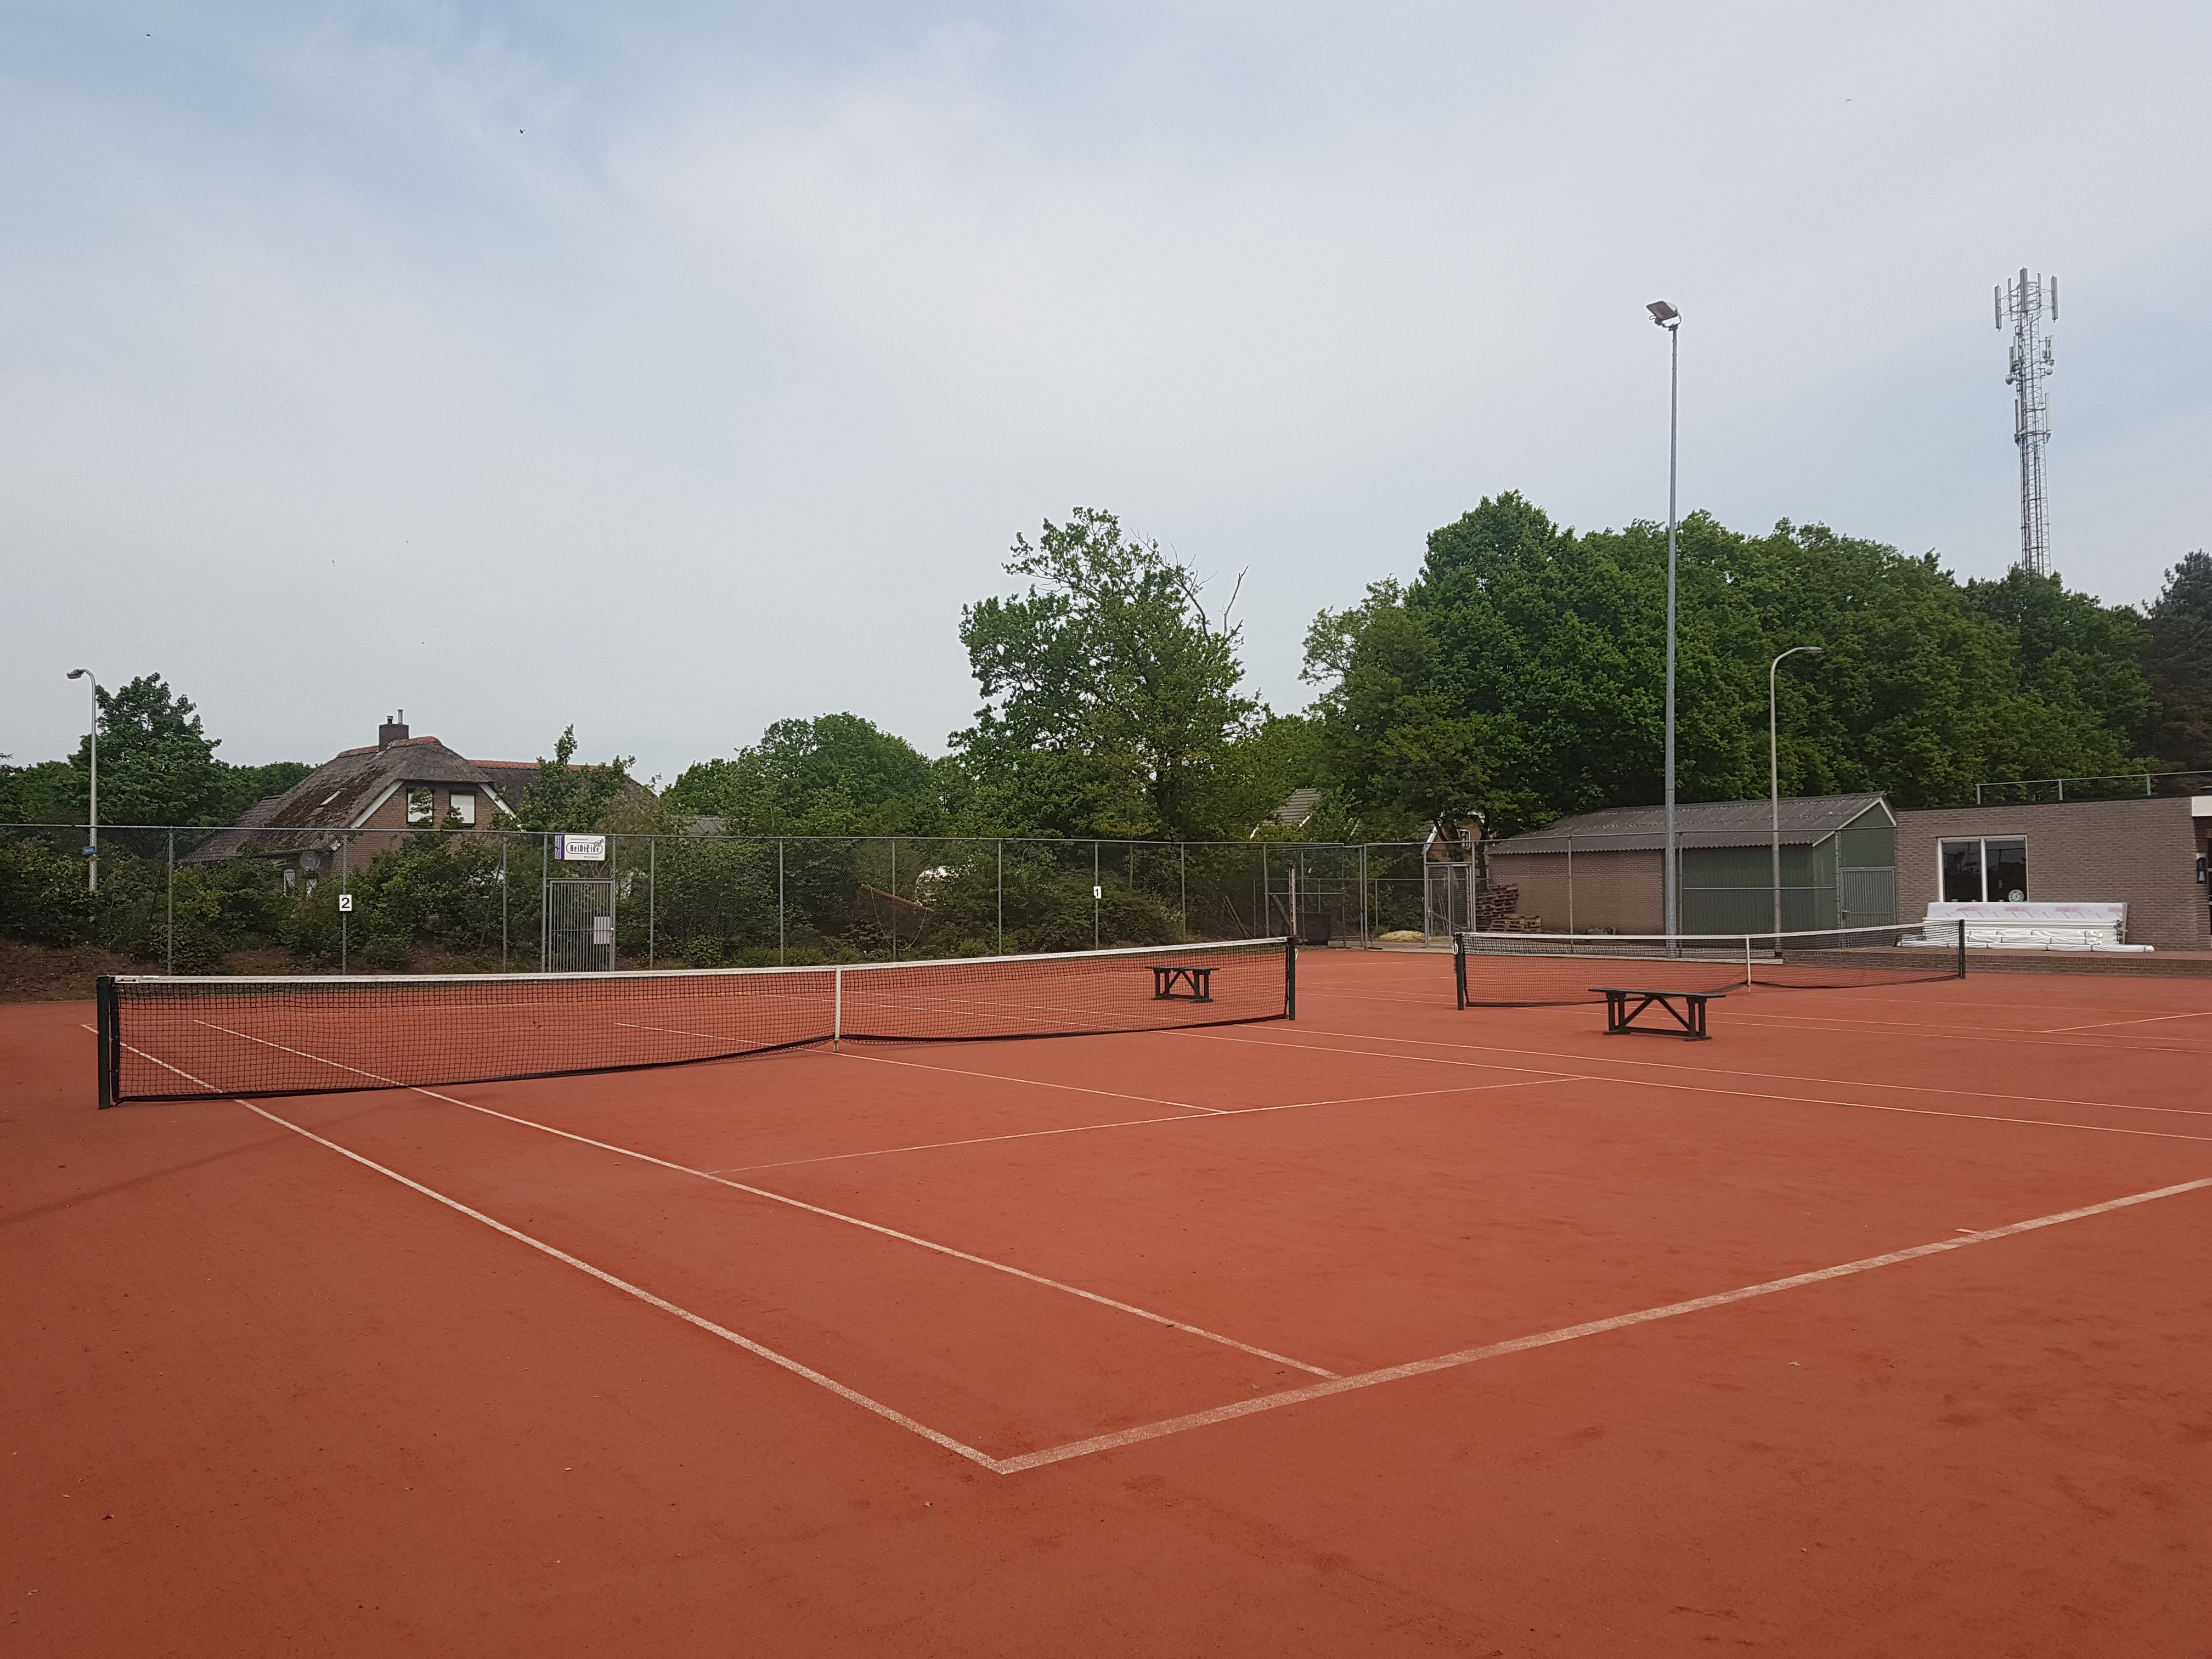 https://www.debelte.nl/wp-content/uploads/2016/11/Tennisbaan.jpg